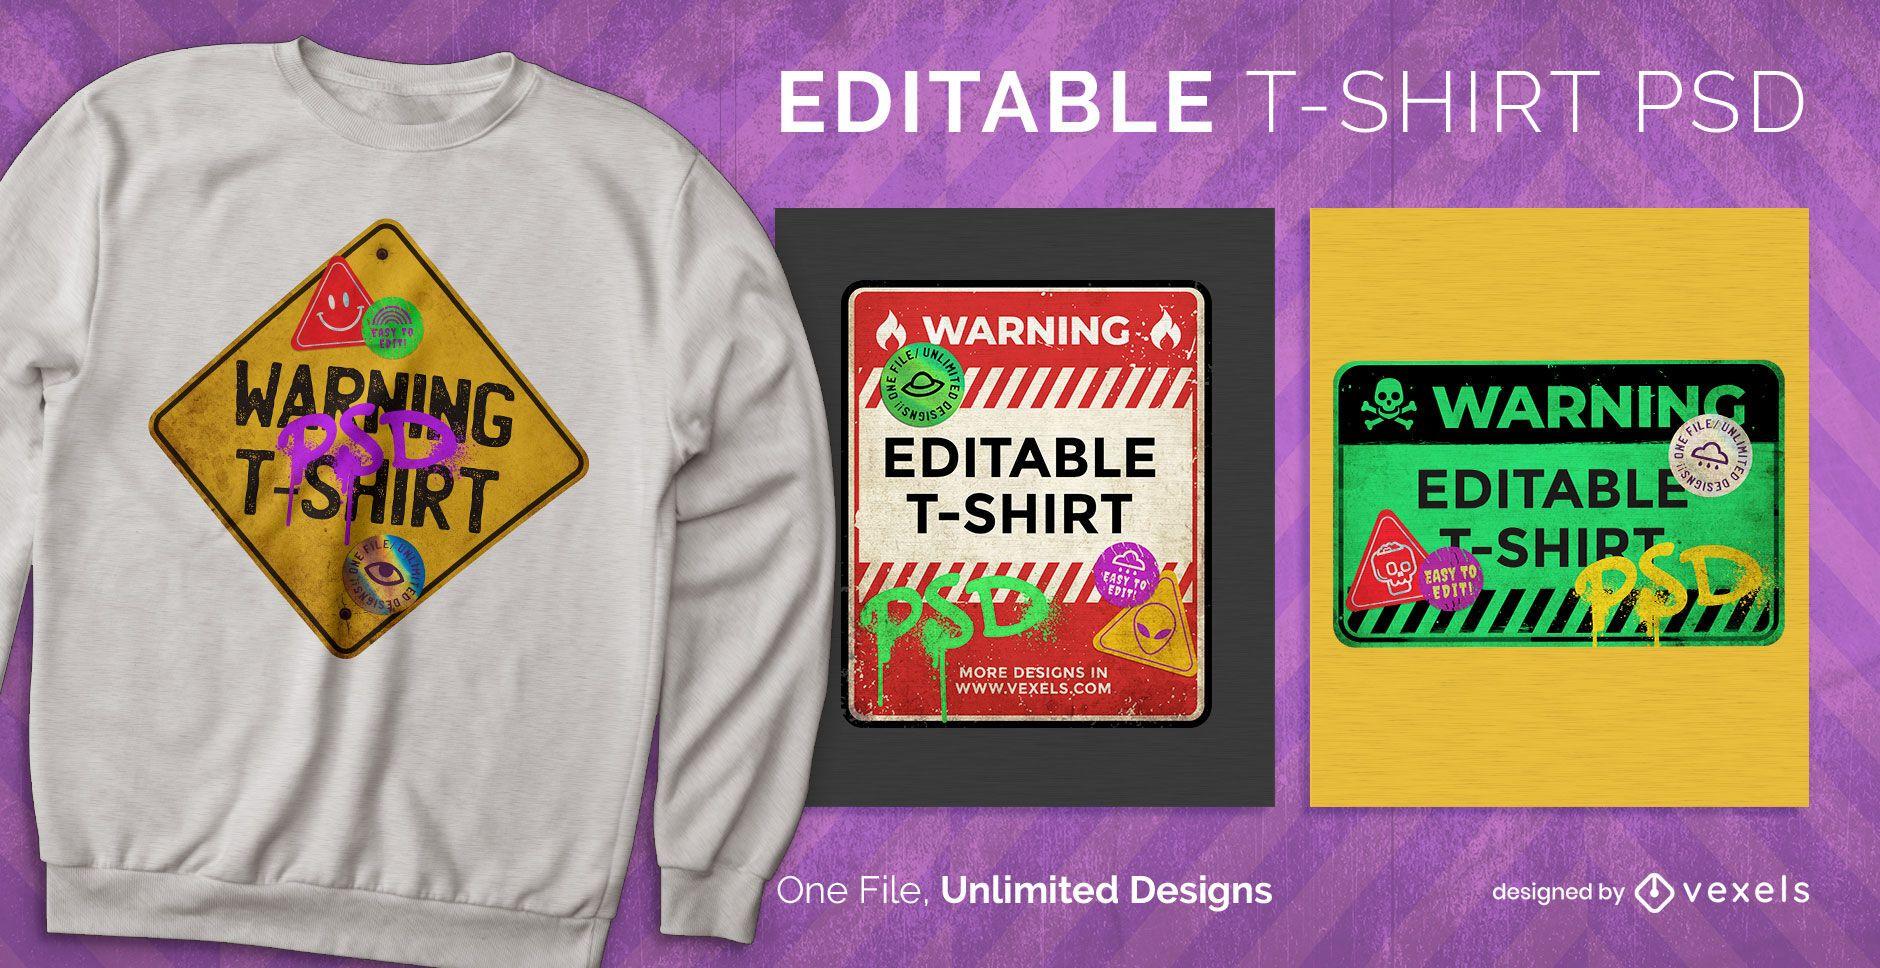 Warning sign scalable t-shirt psd